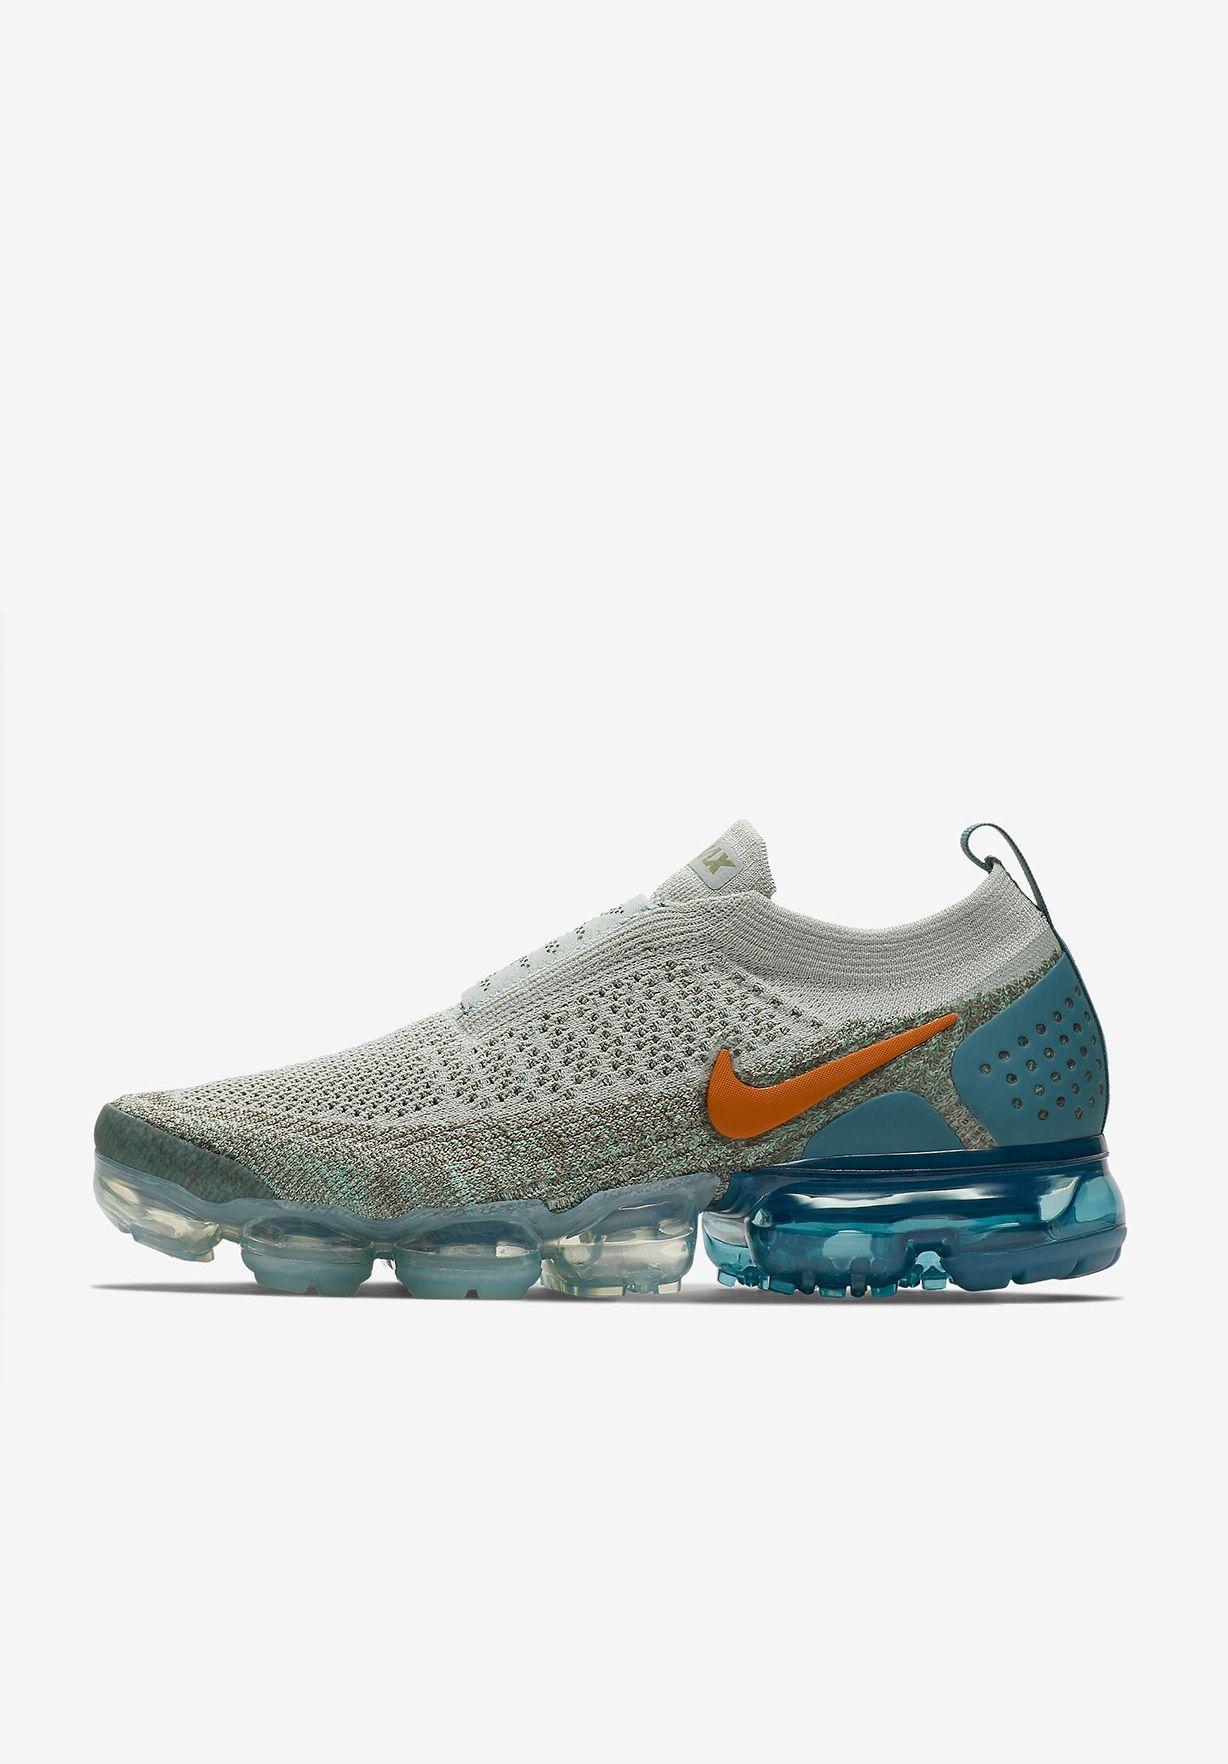 new product dbbf3 0fe6c Nike Air Vapormax 2